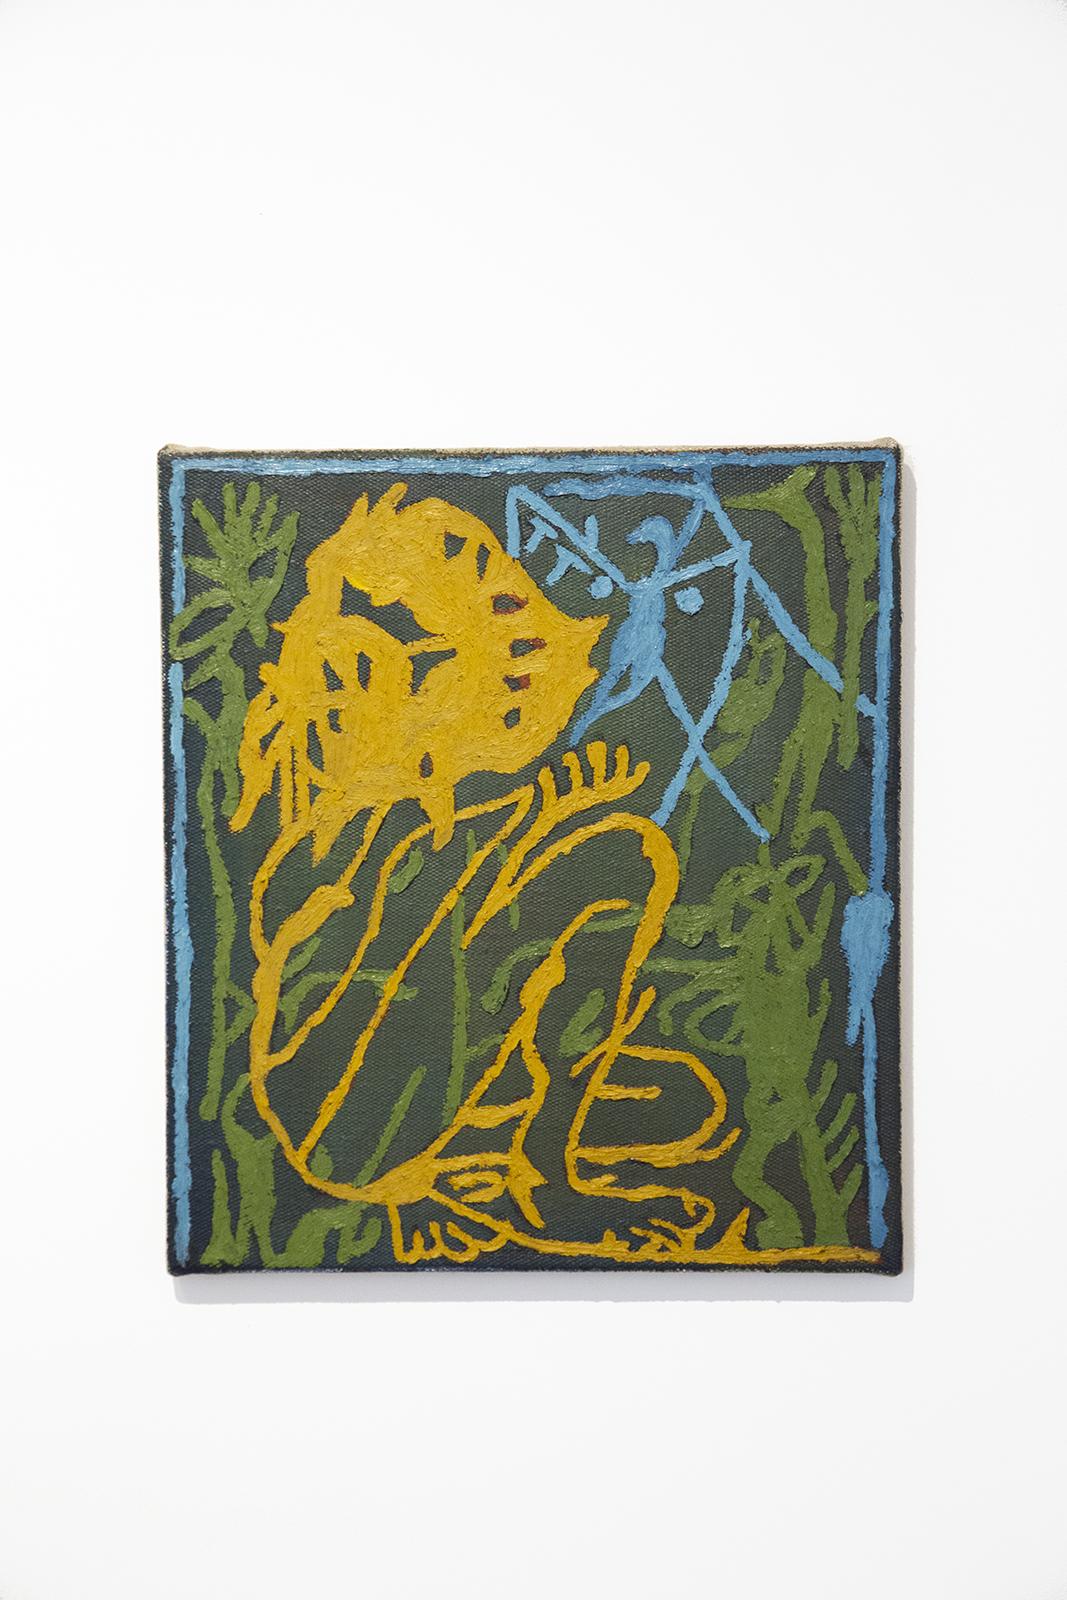 Daniel Gibson at Public Land Gallery in Sacramento